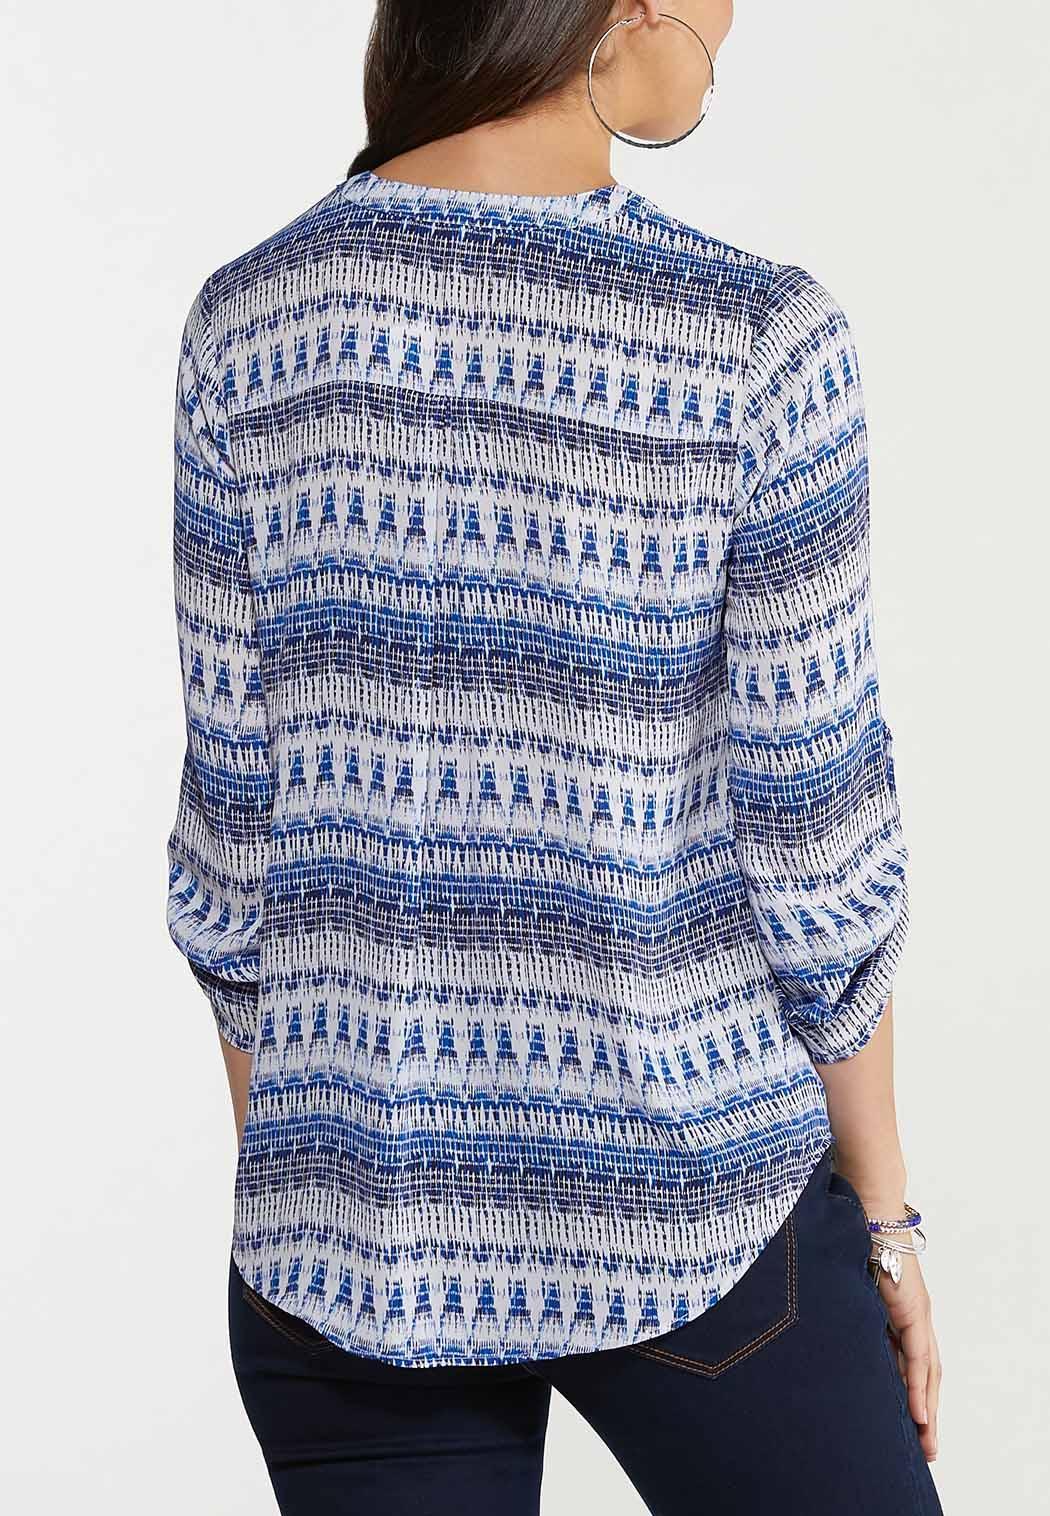 Brushed Blue Zip Front Top (Item #44535287)